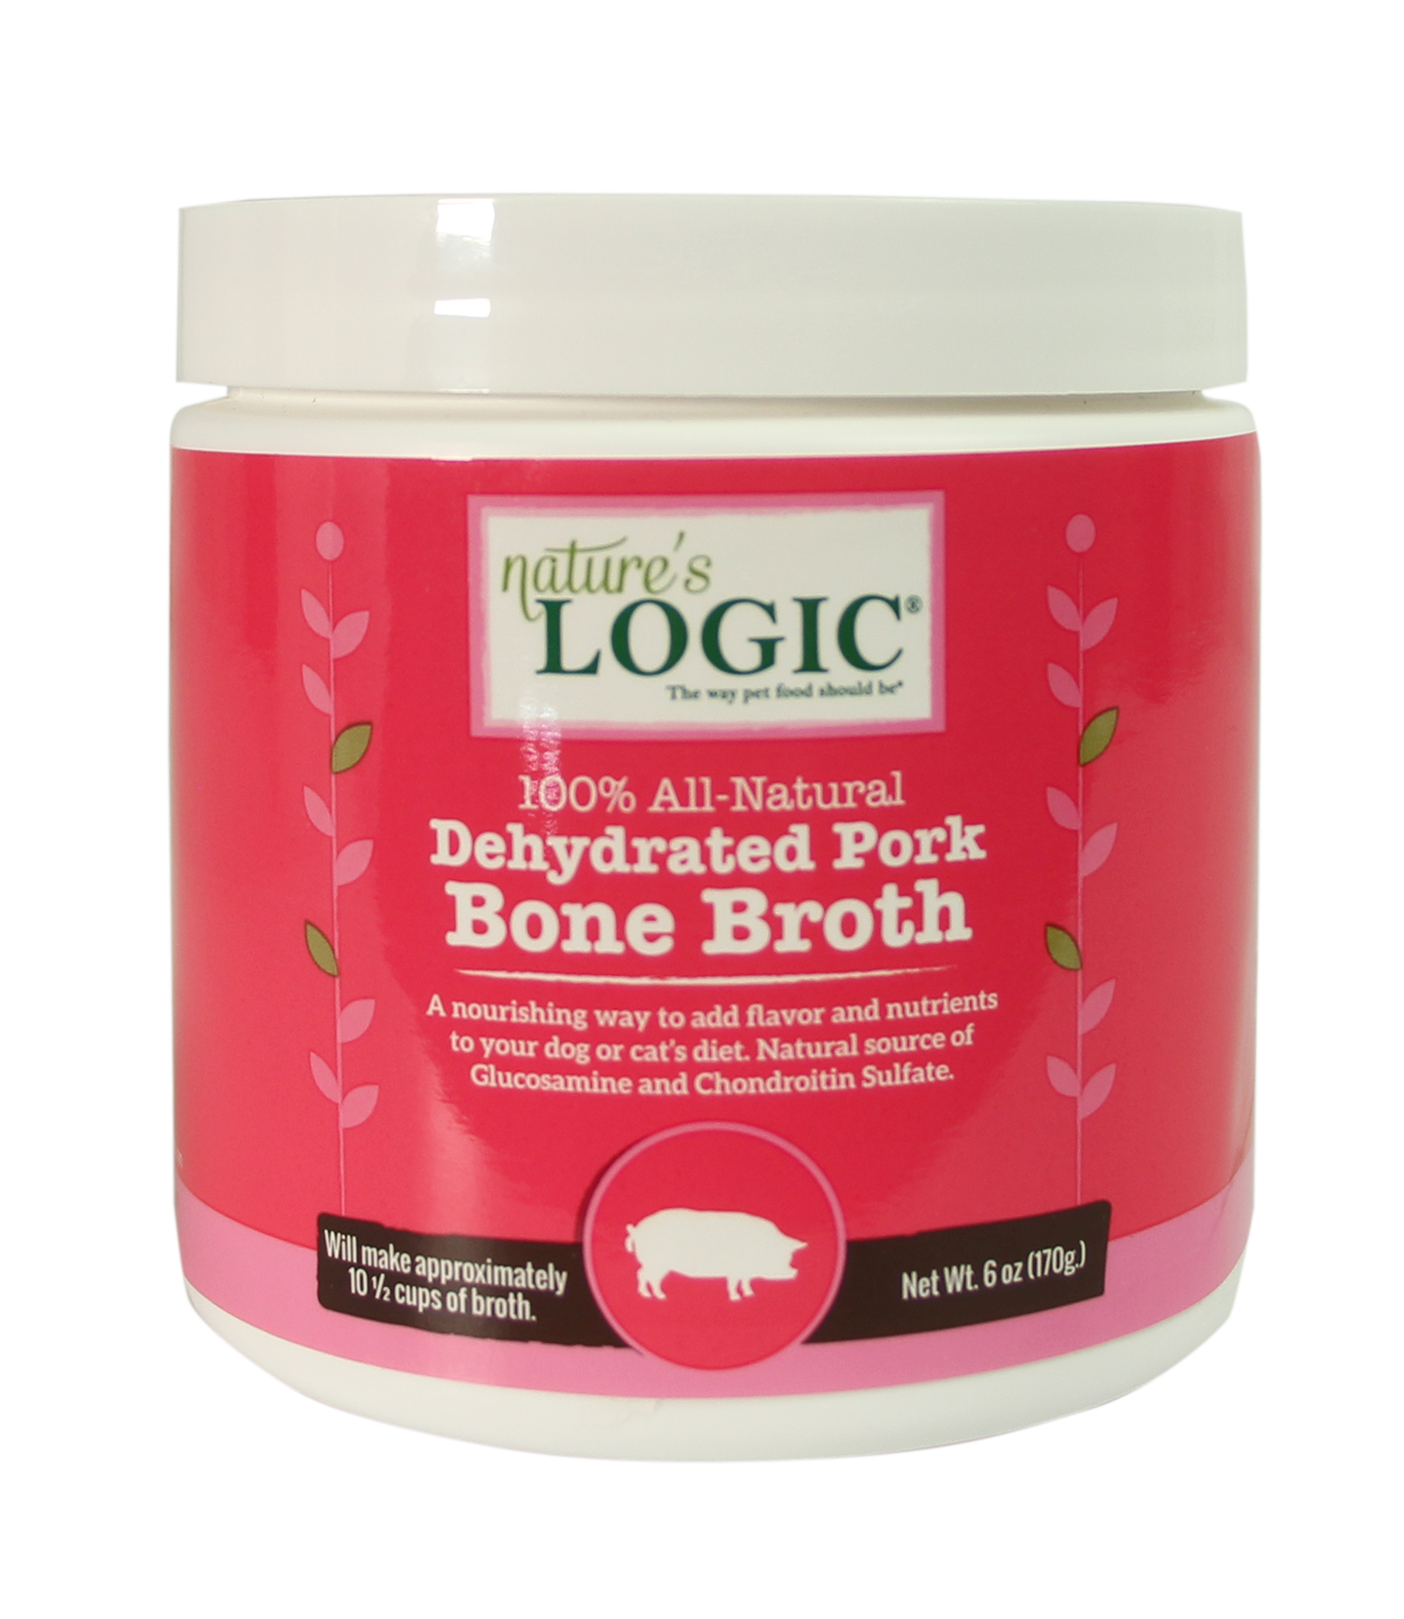 Nature's Logic Nature's Logic Dehydrated Bone Broth Pork 6oz